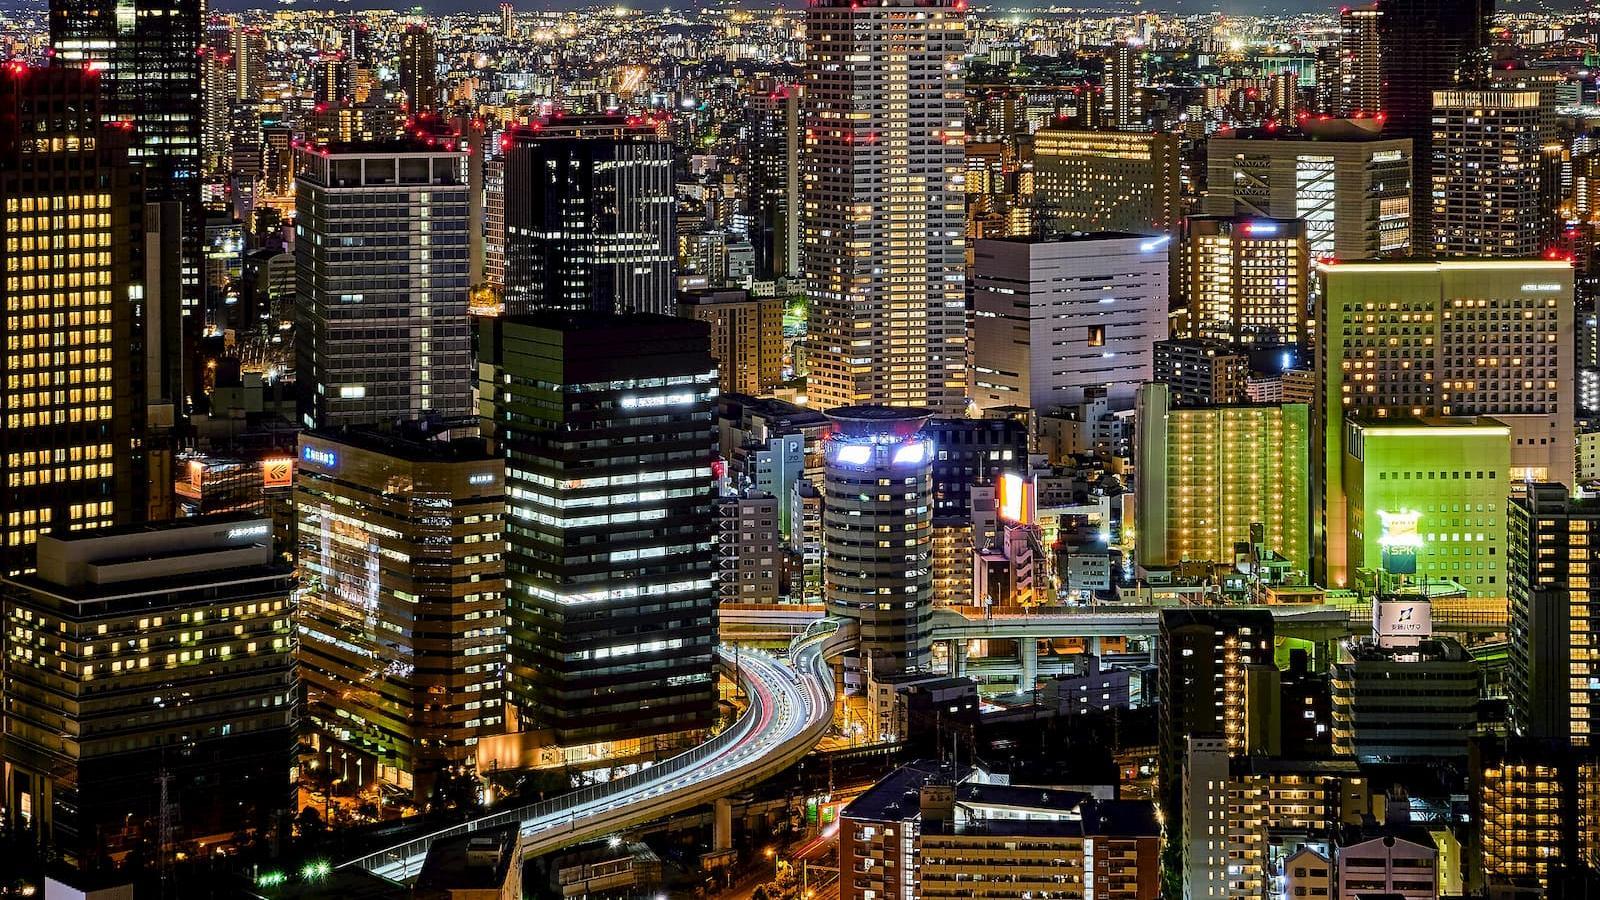 Qatar Airways to start direct flights to Osaka, Japan from April next year